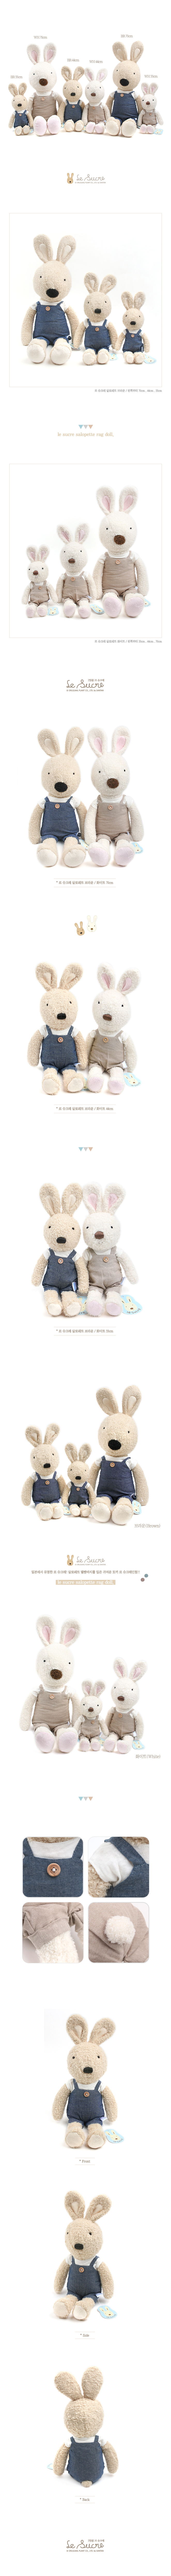 le sucre 르슈크레 살로페트 인형-33cm (색상선택) - 누리토이즈, 23,940원, 애니멀인형, 토끼 인형